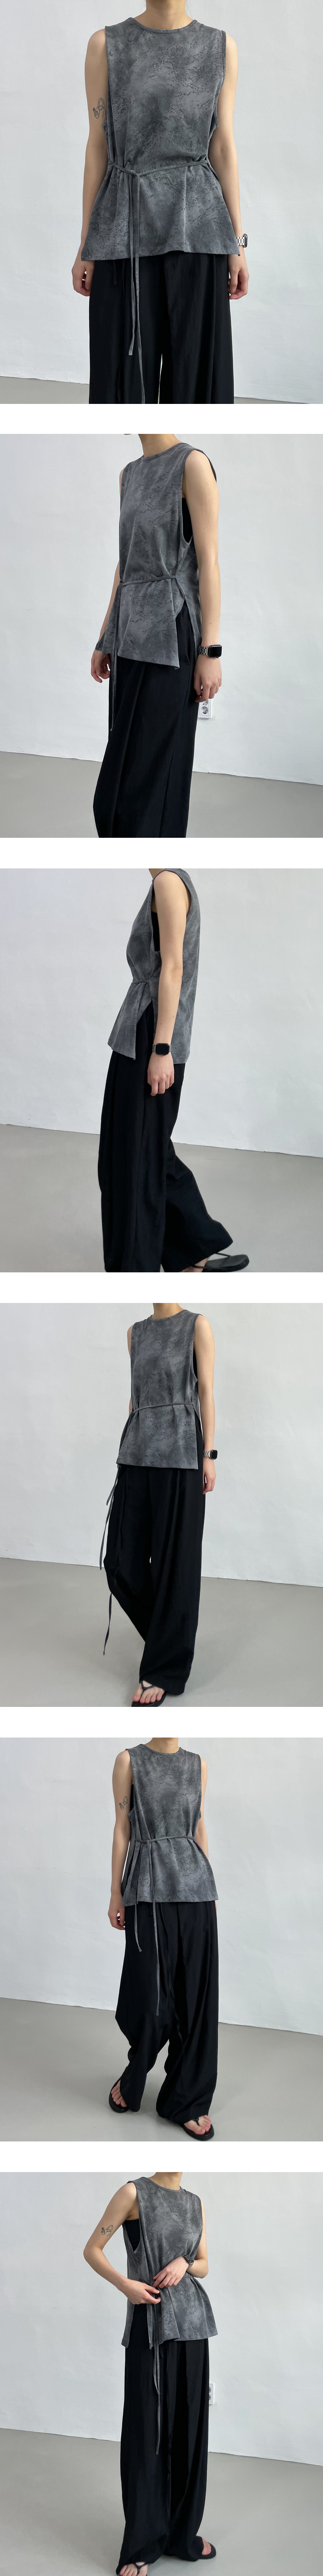 Bolt Printed Strap Sleeveless